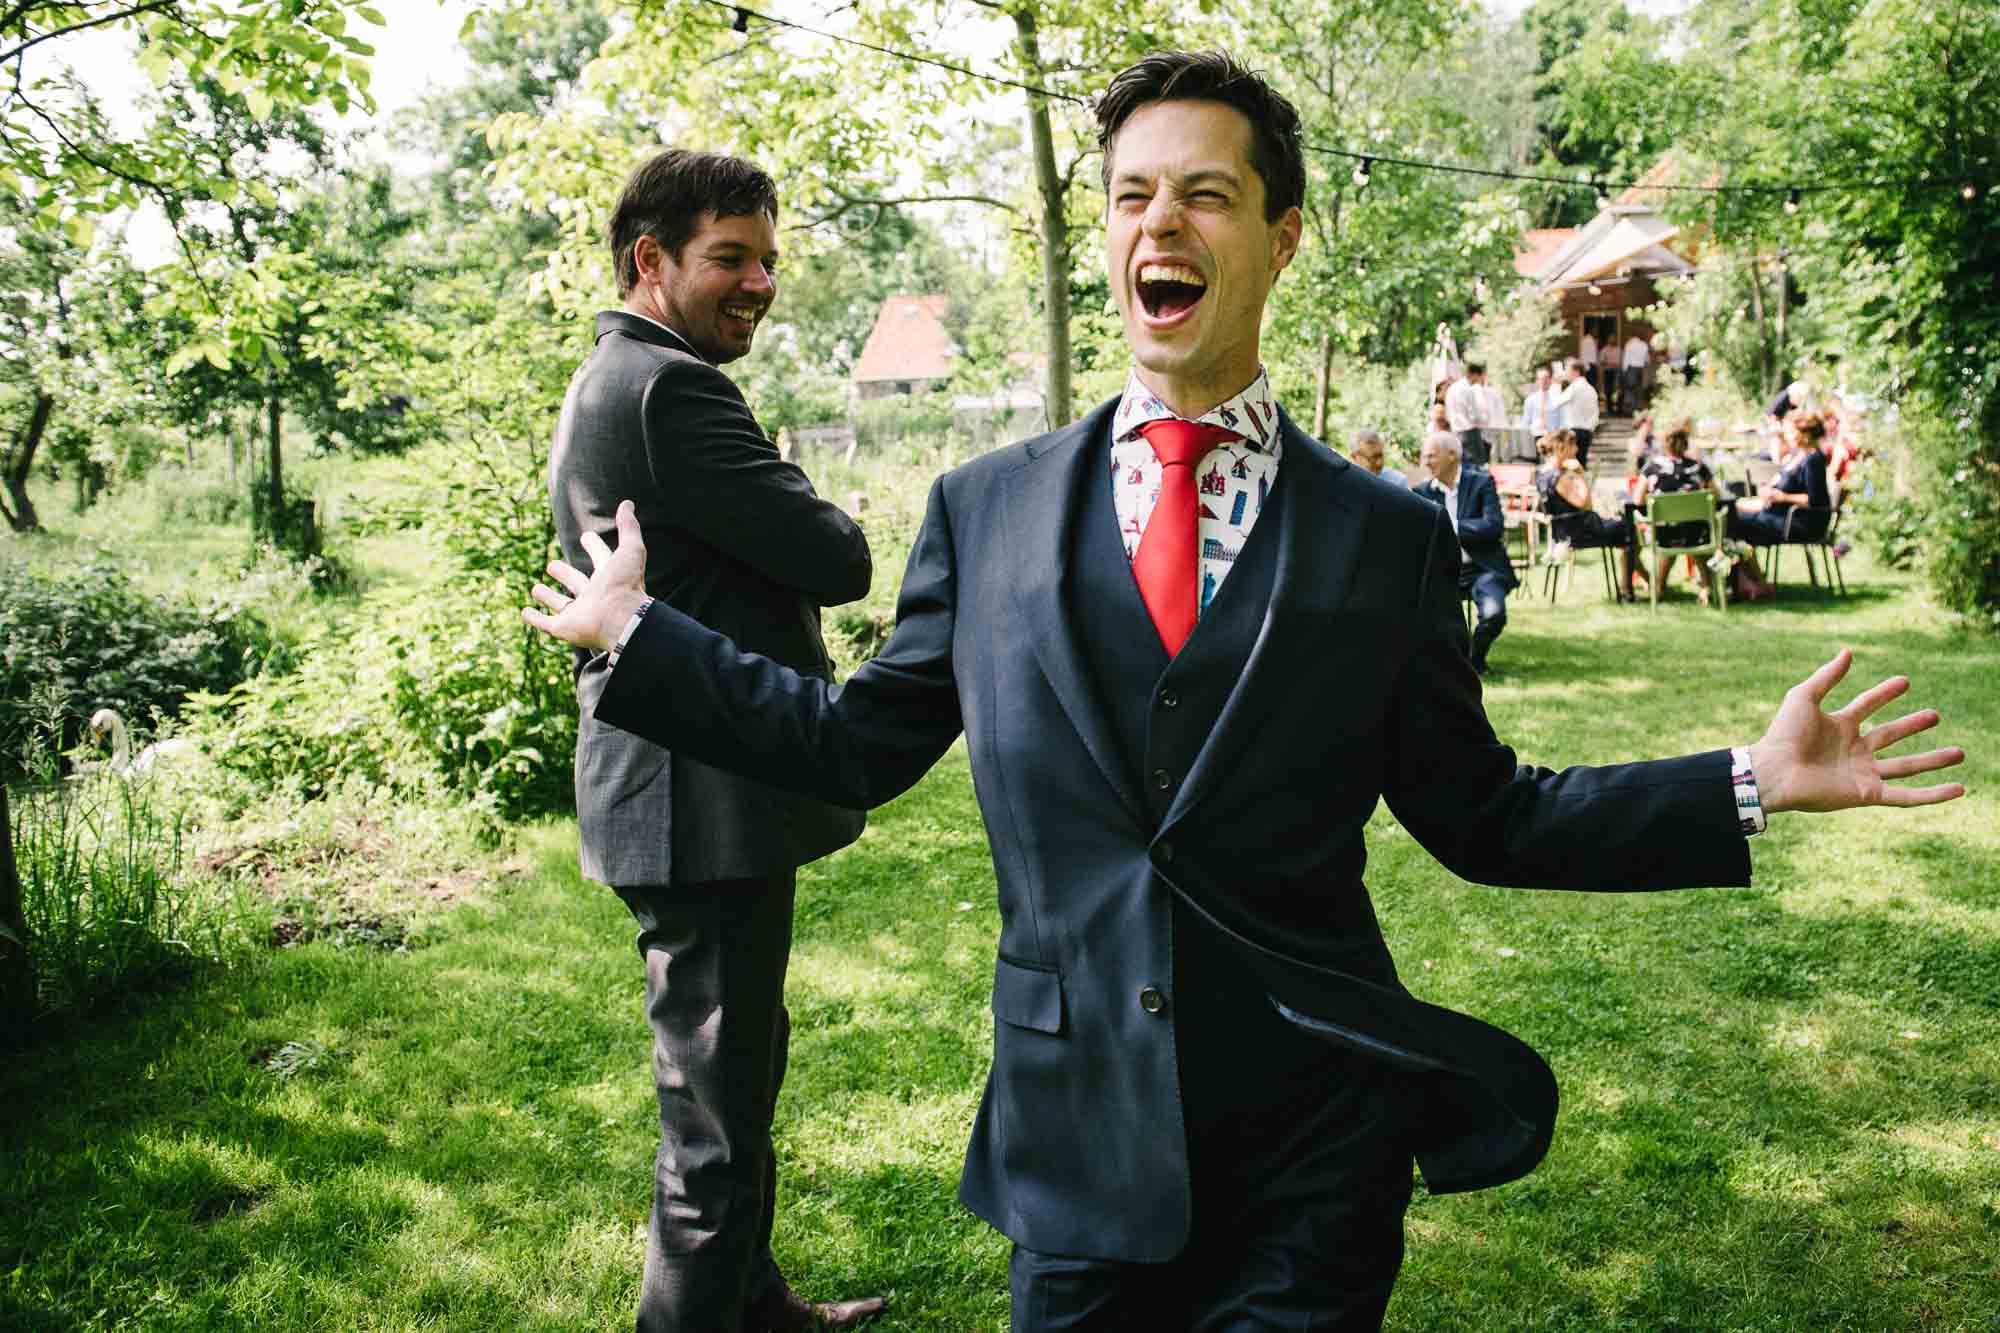 grappige bruidsfoto